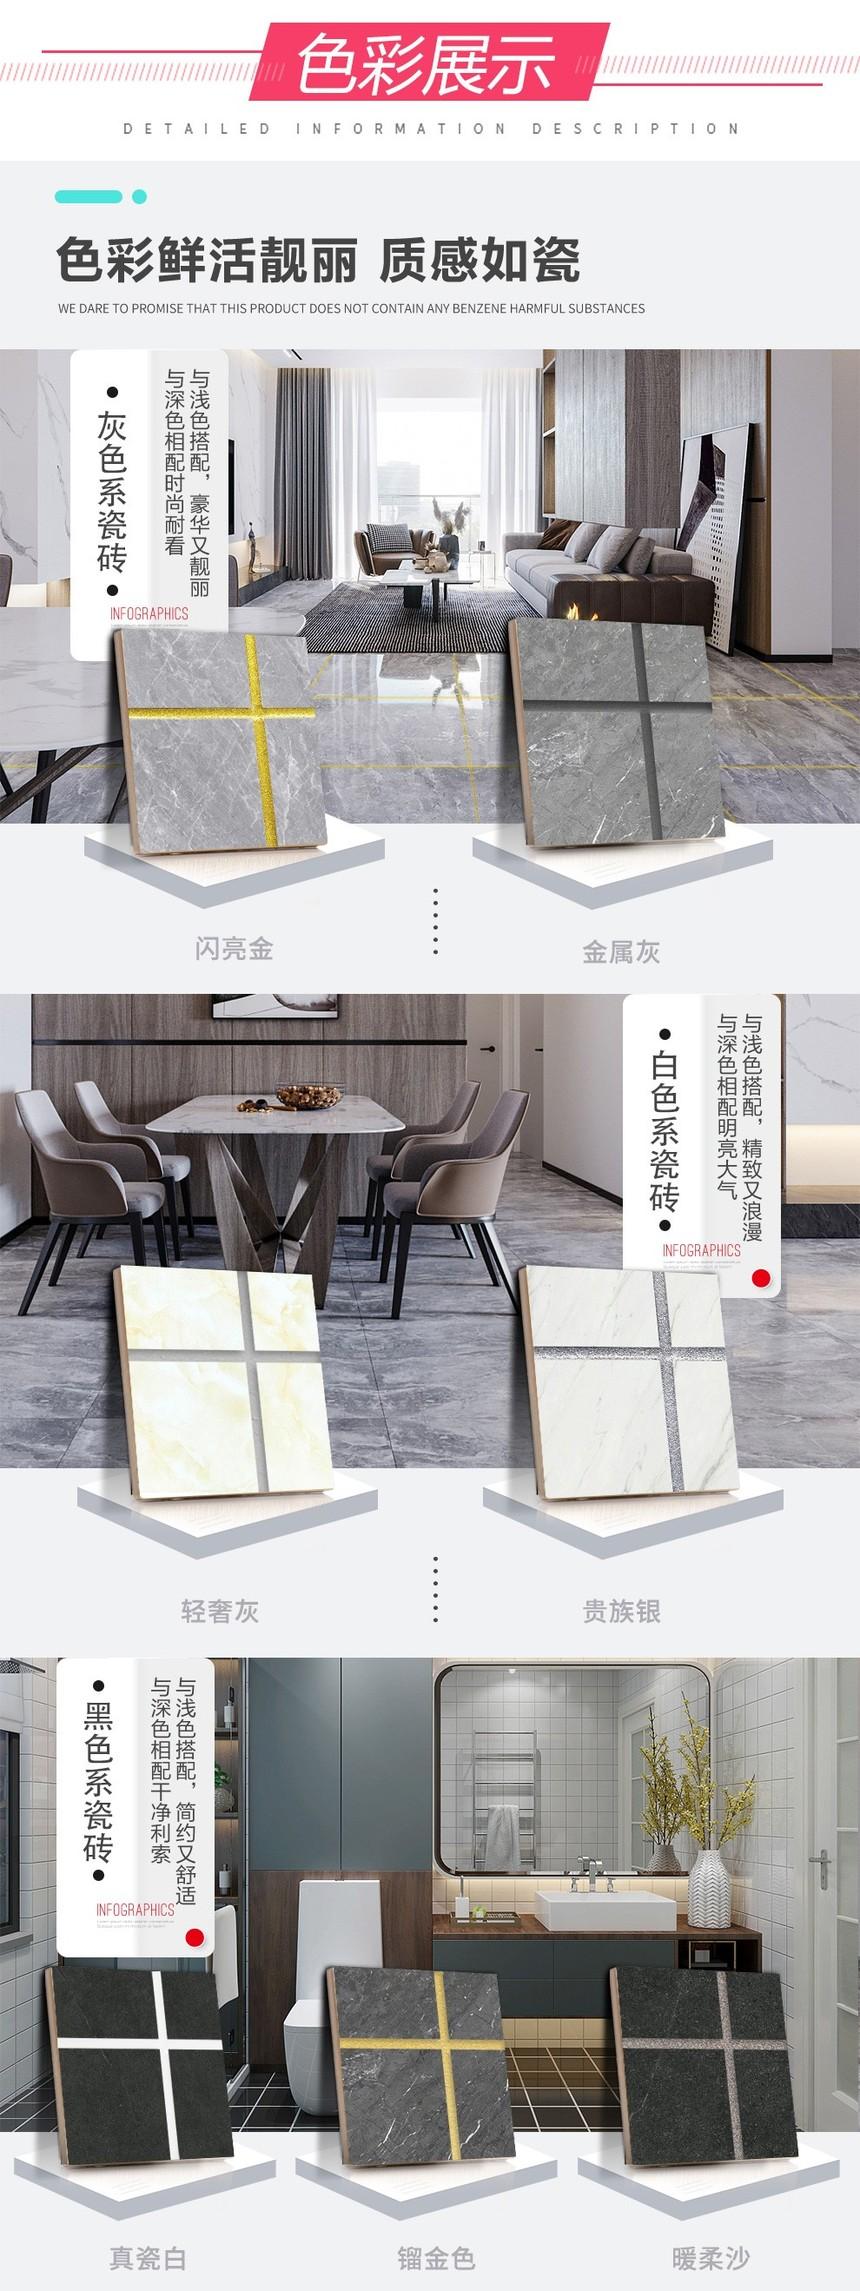 DIY美缝详情页-0603-定稿(1)_13.jpg